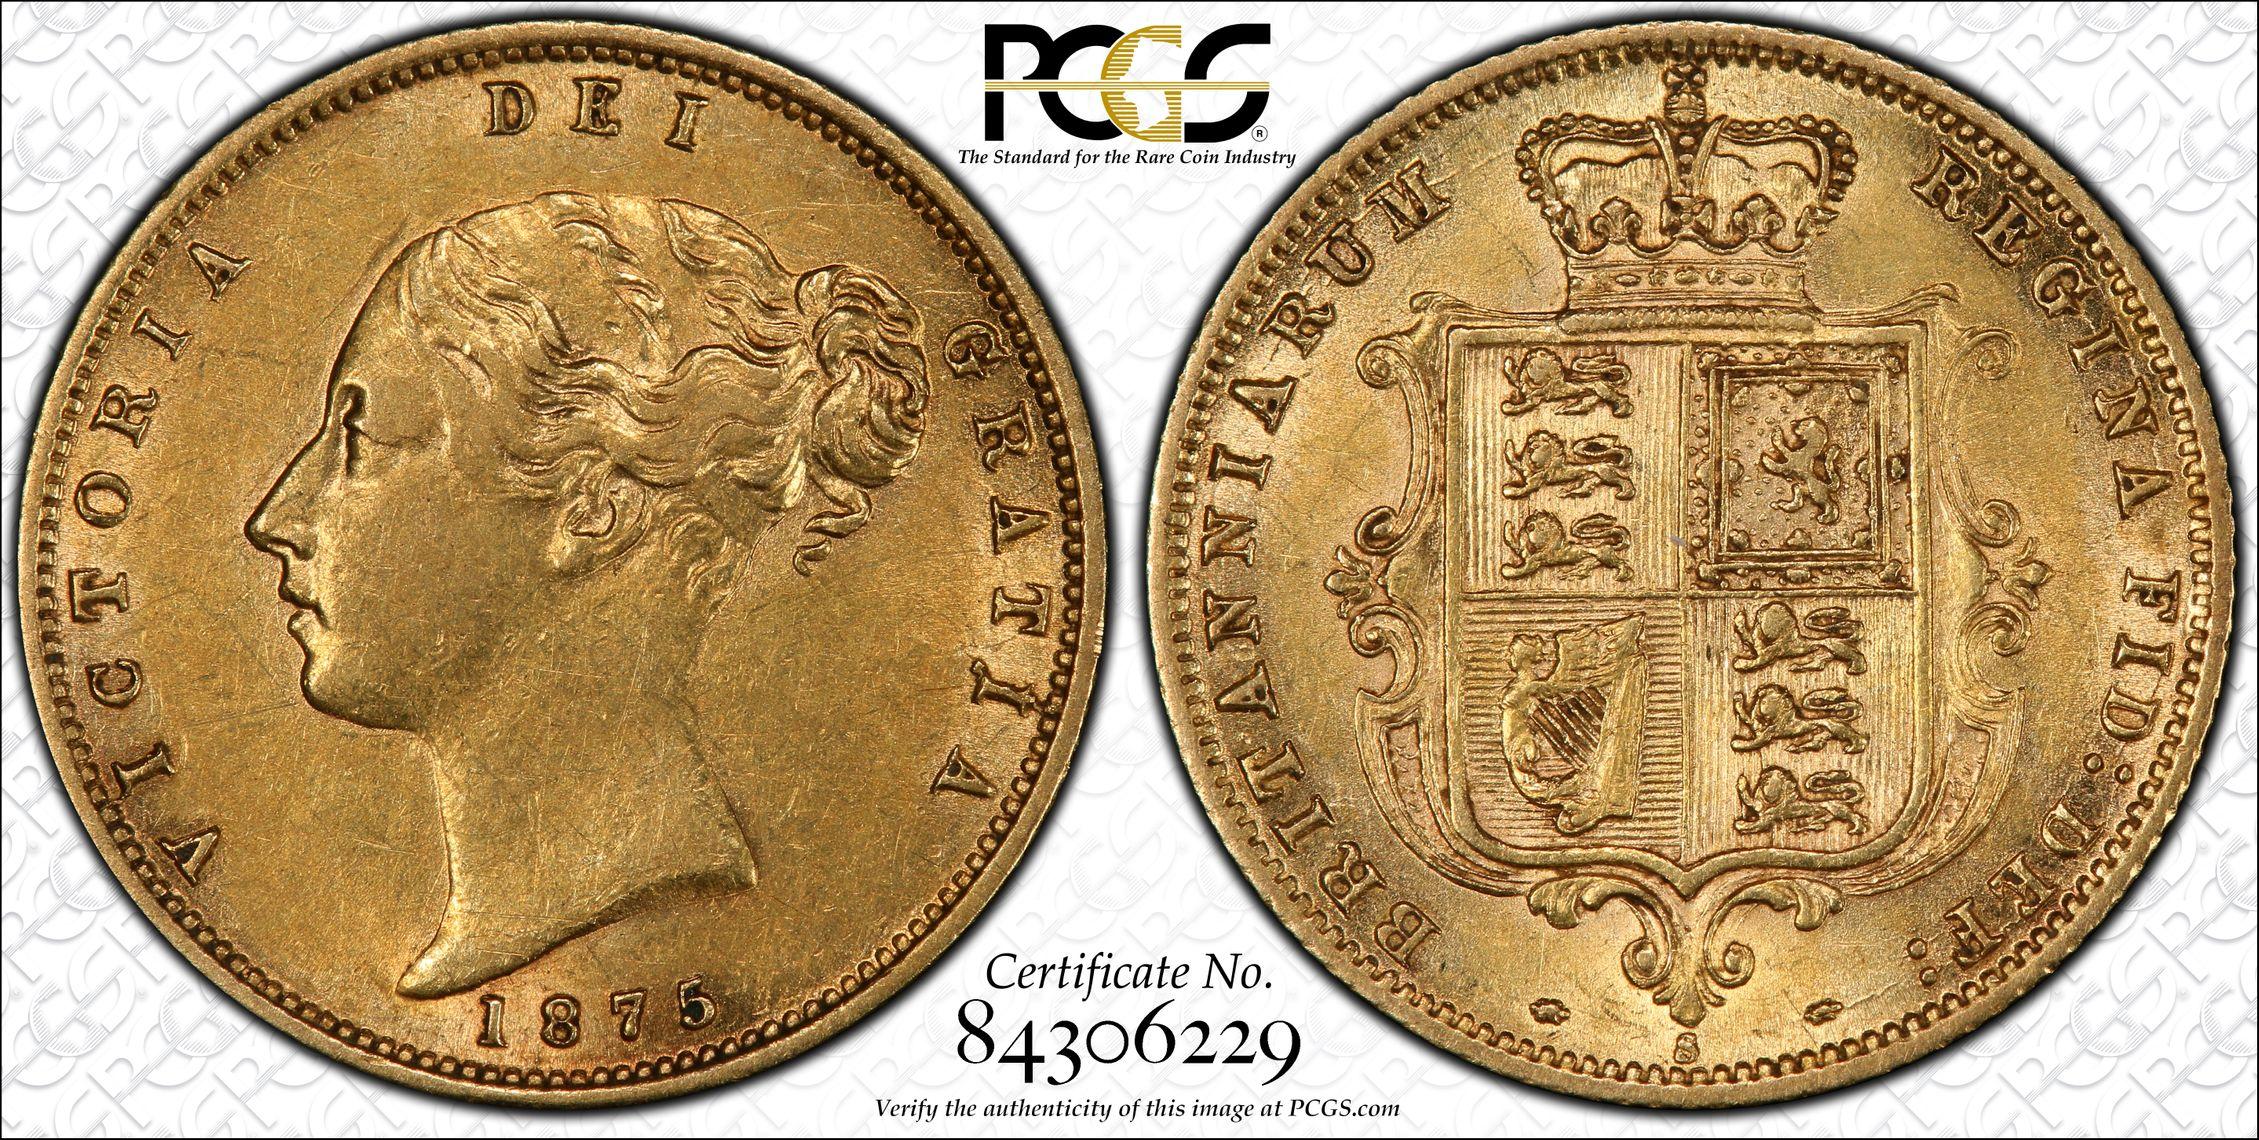 Australia 1875 Sydney Half Sovereign - PCGS AU55